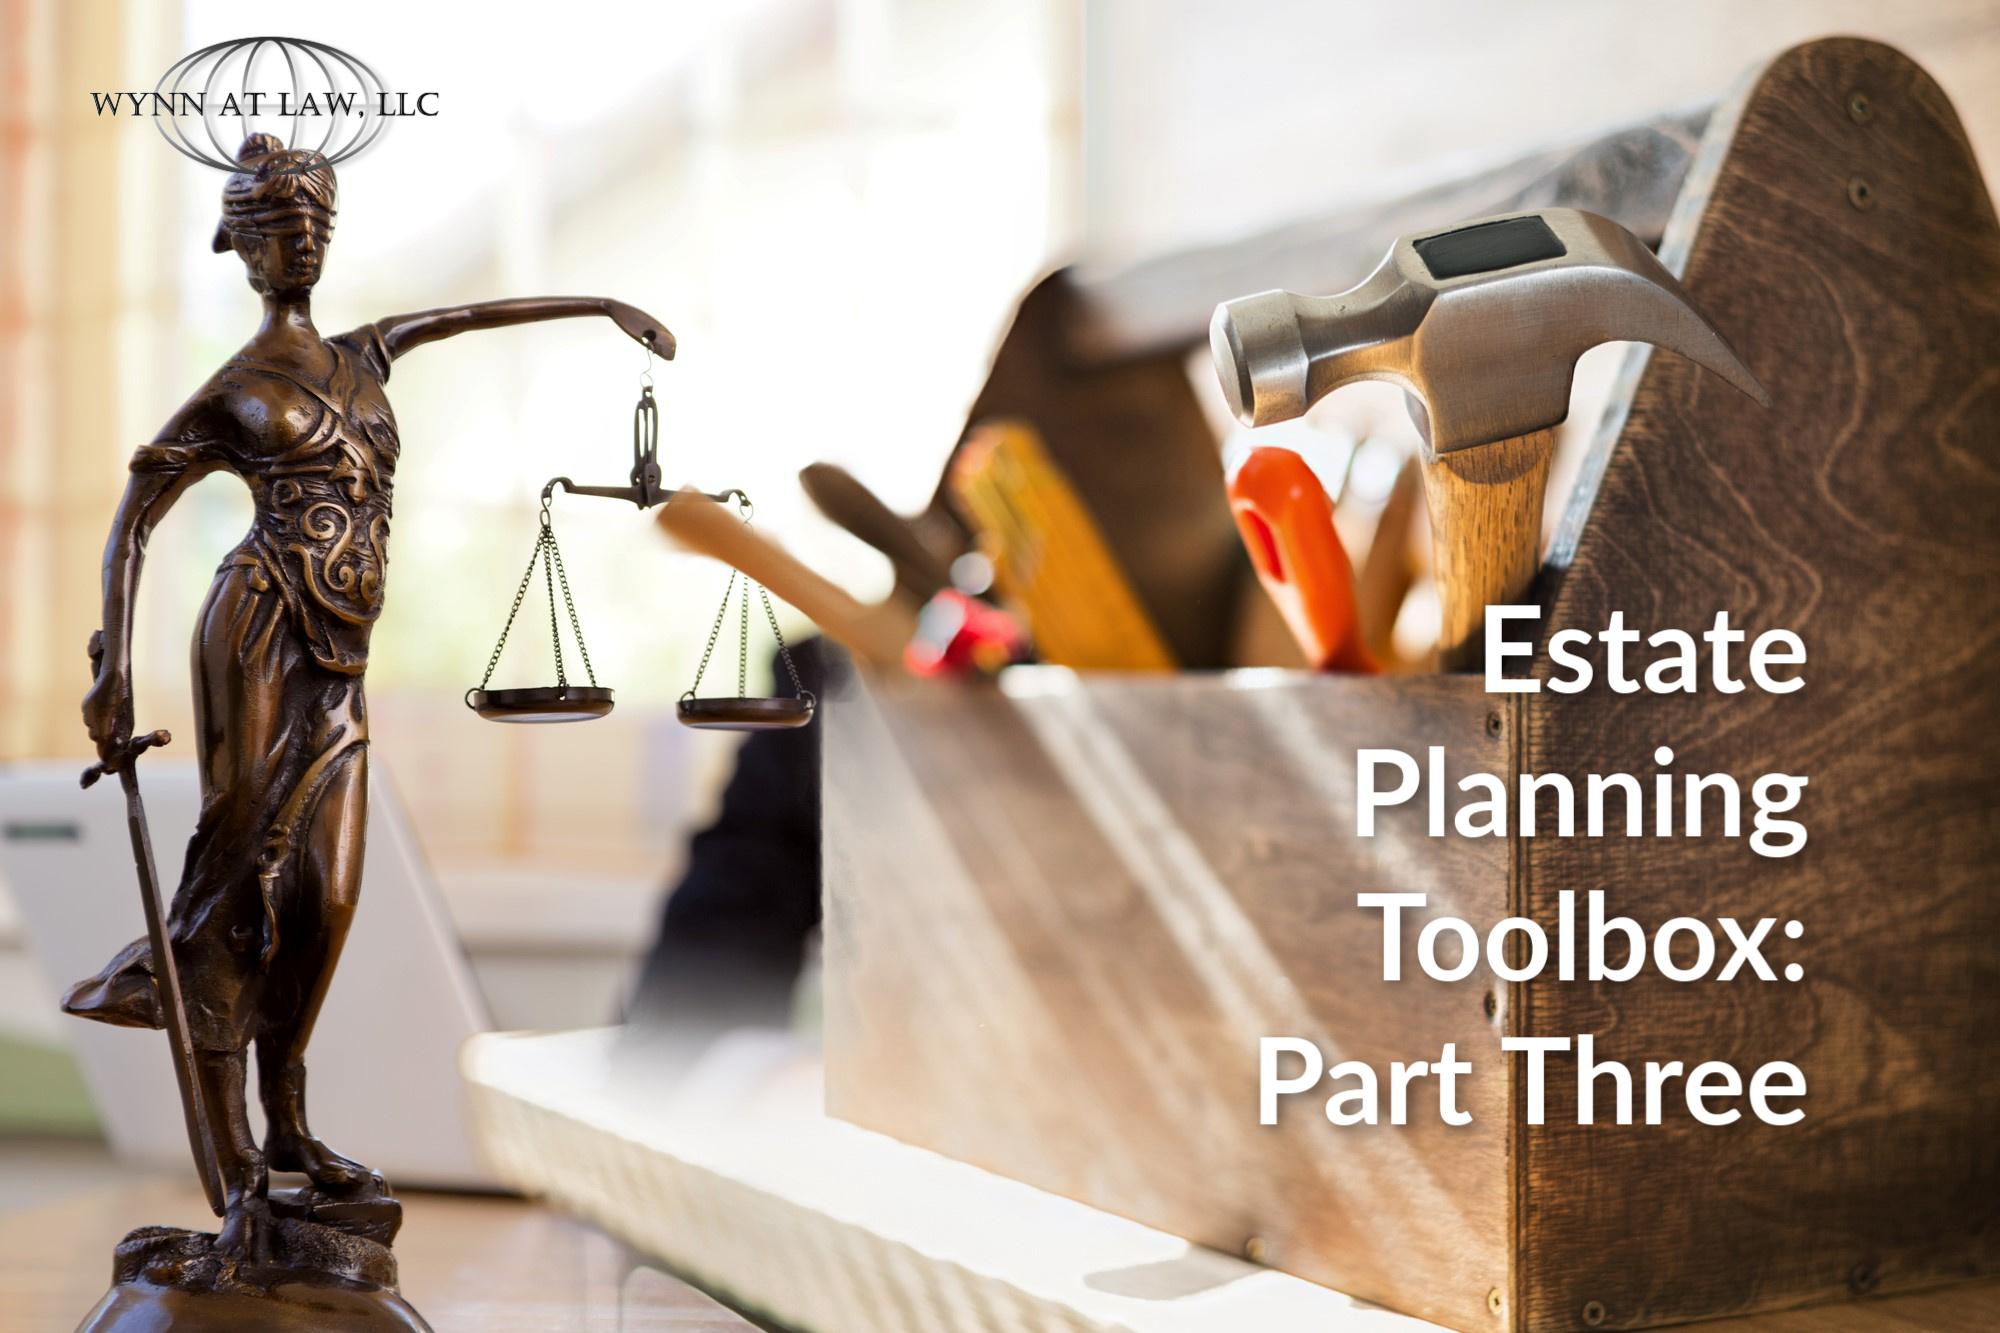 Estate planning toolbox